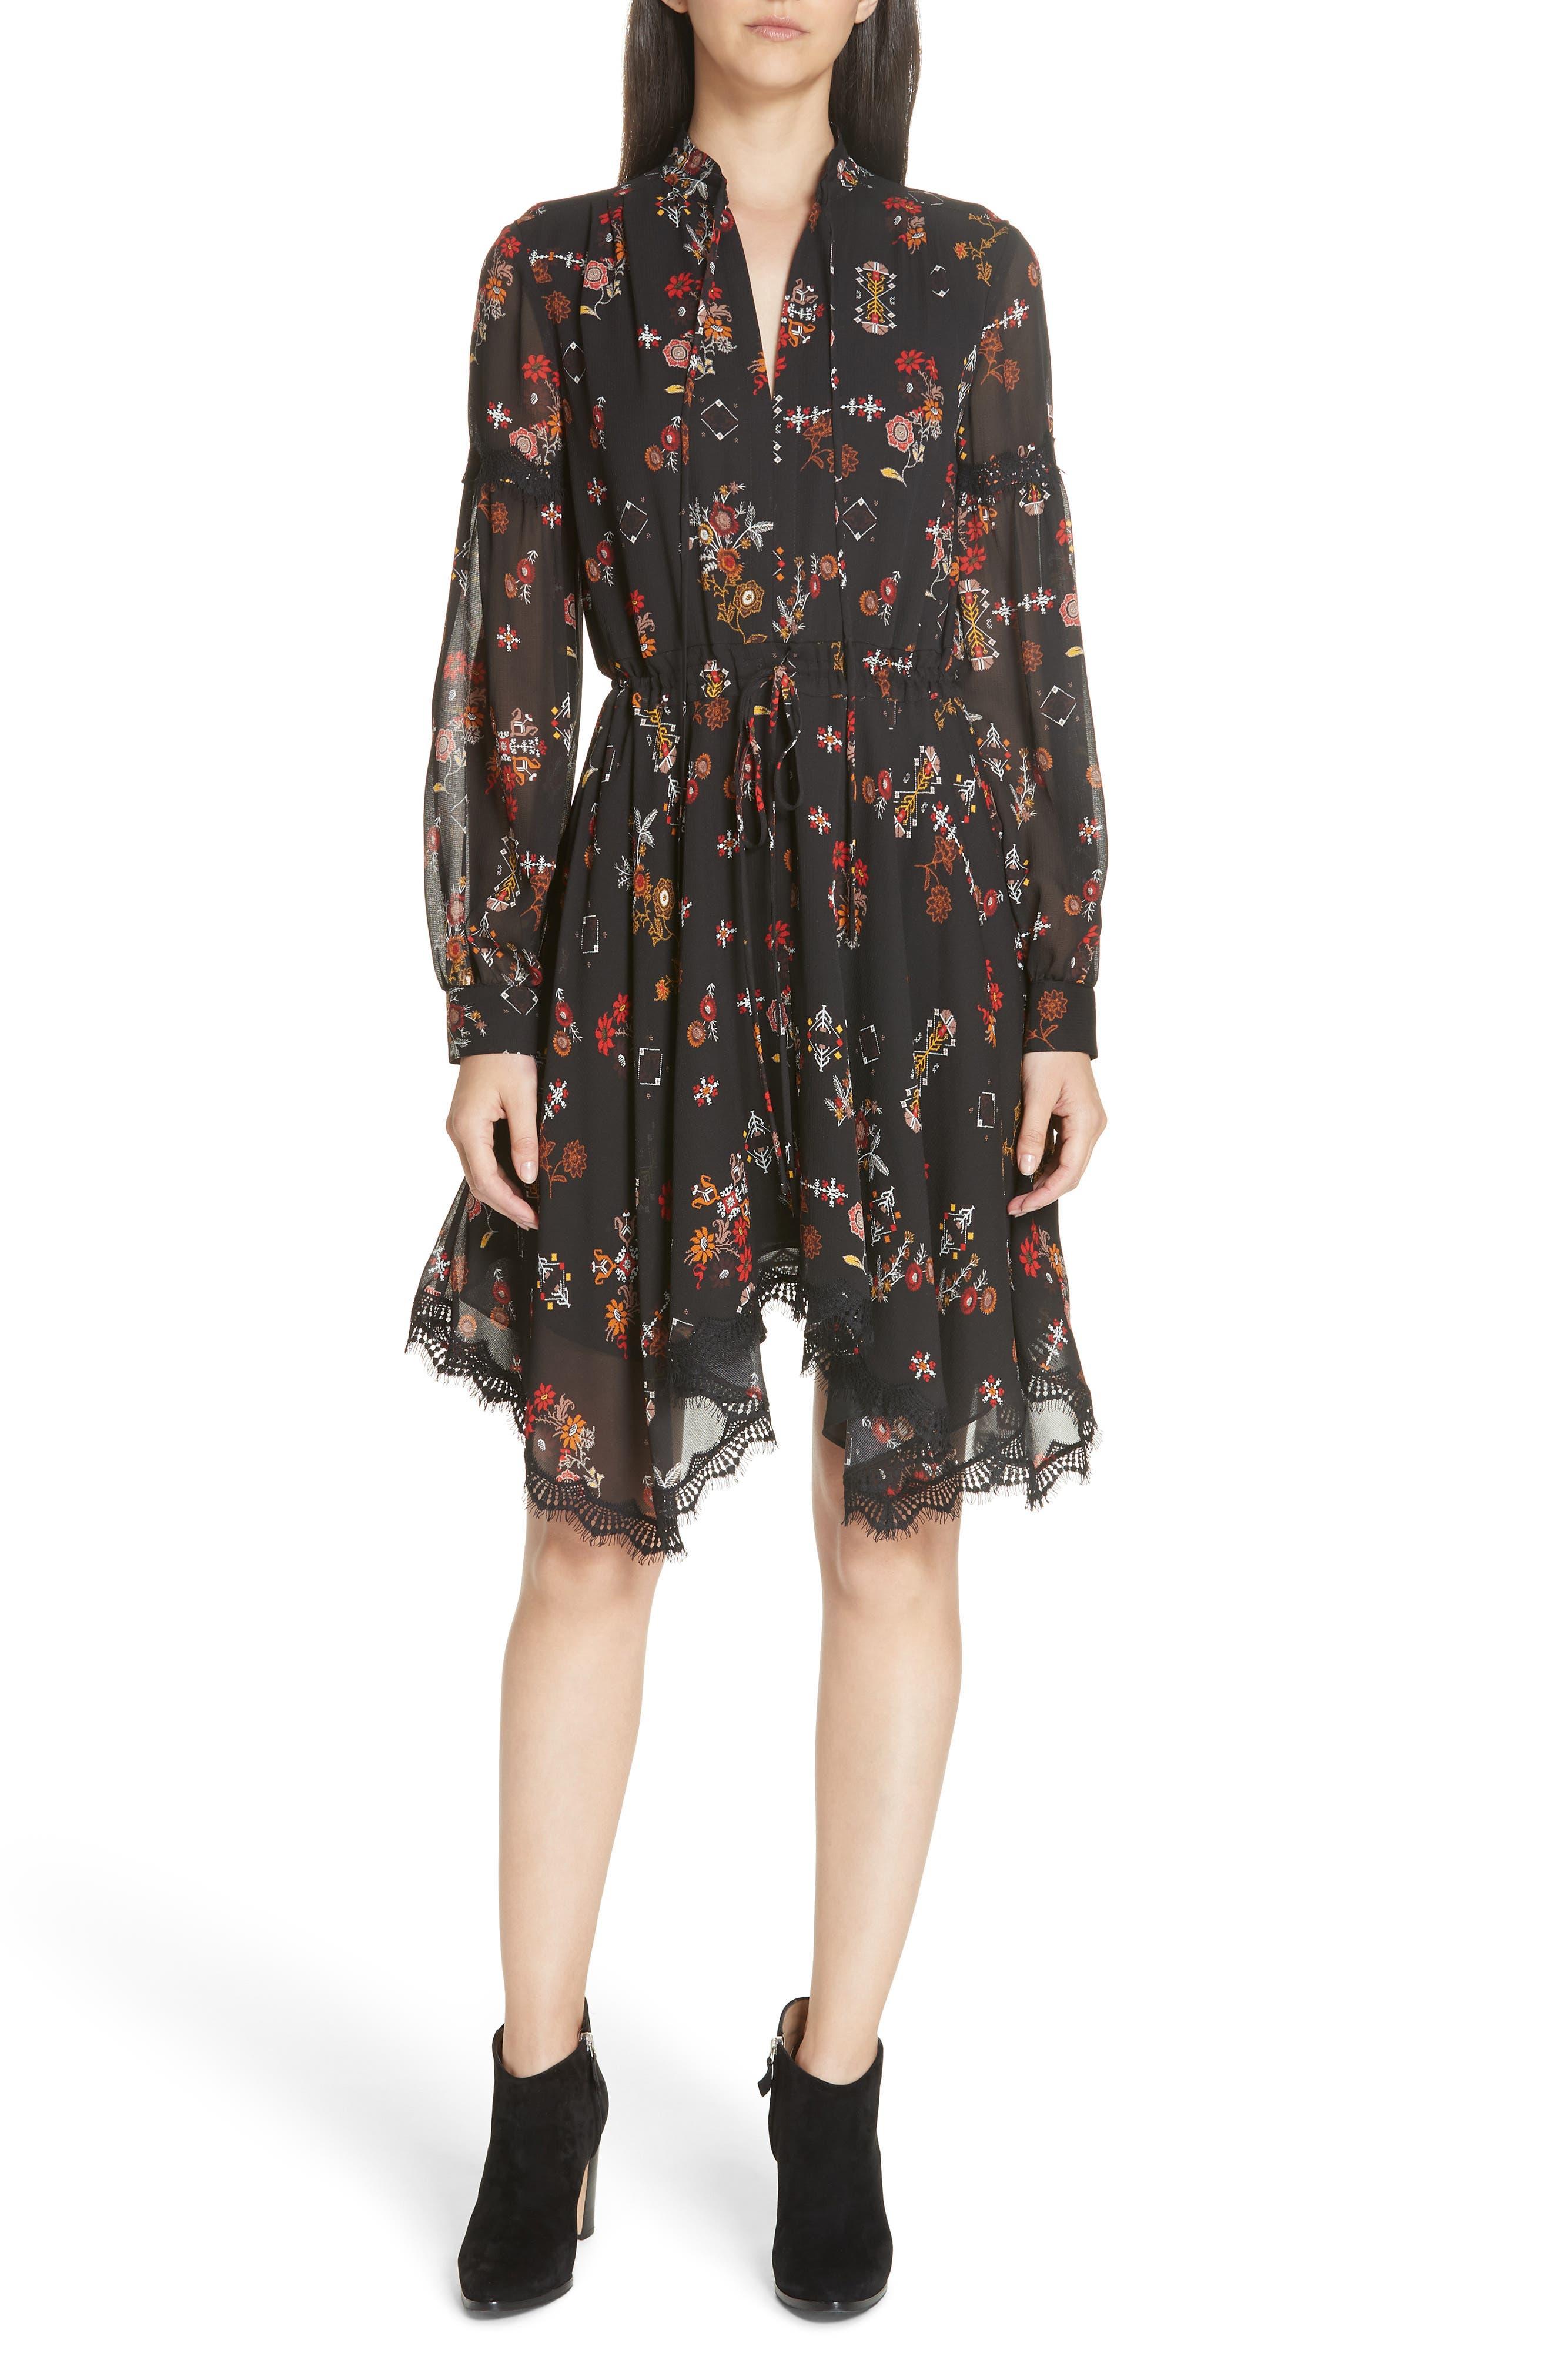 Floral Silk Georgette Handkerchief-Hem Dress - Black Size 10